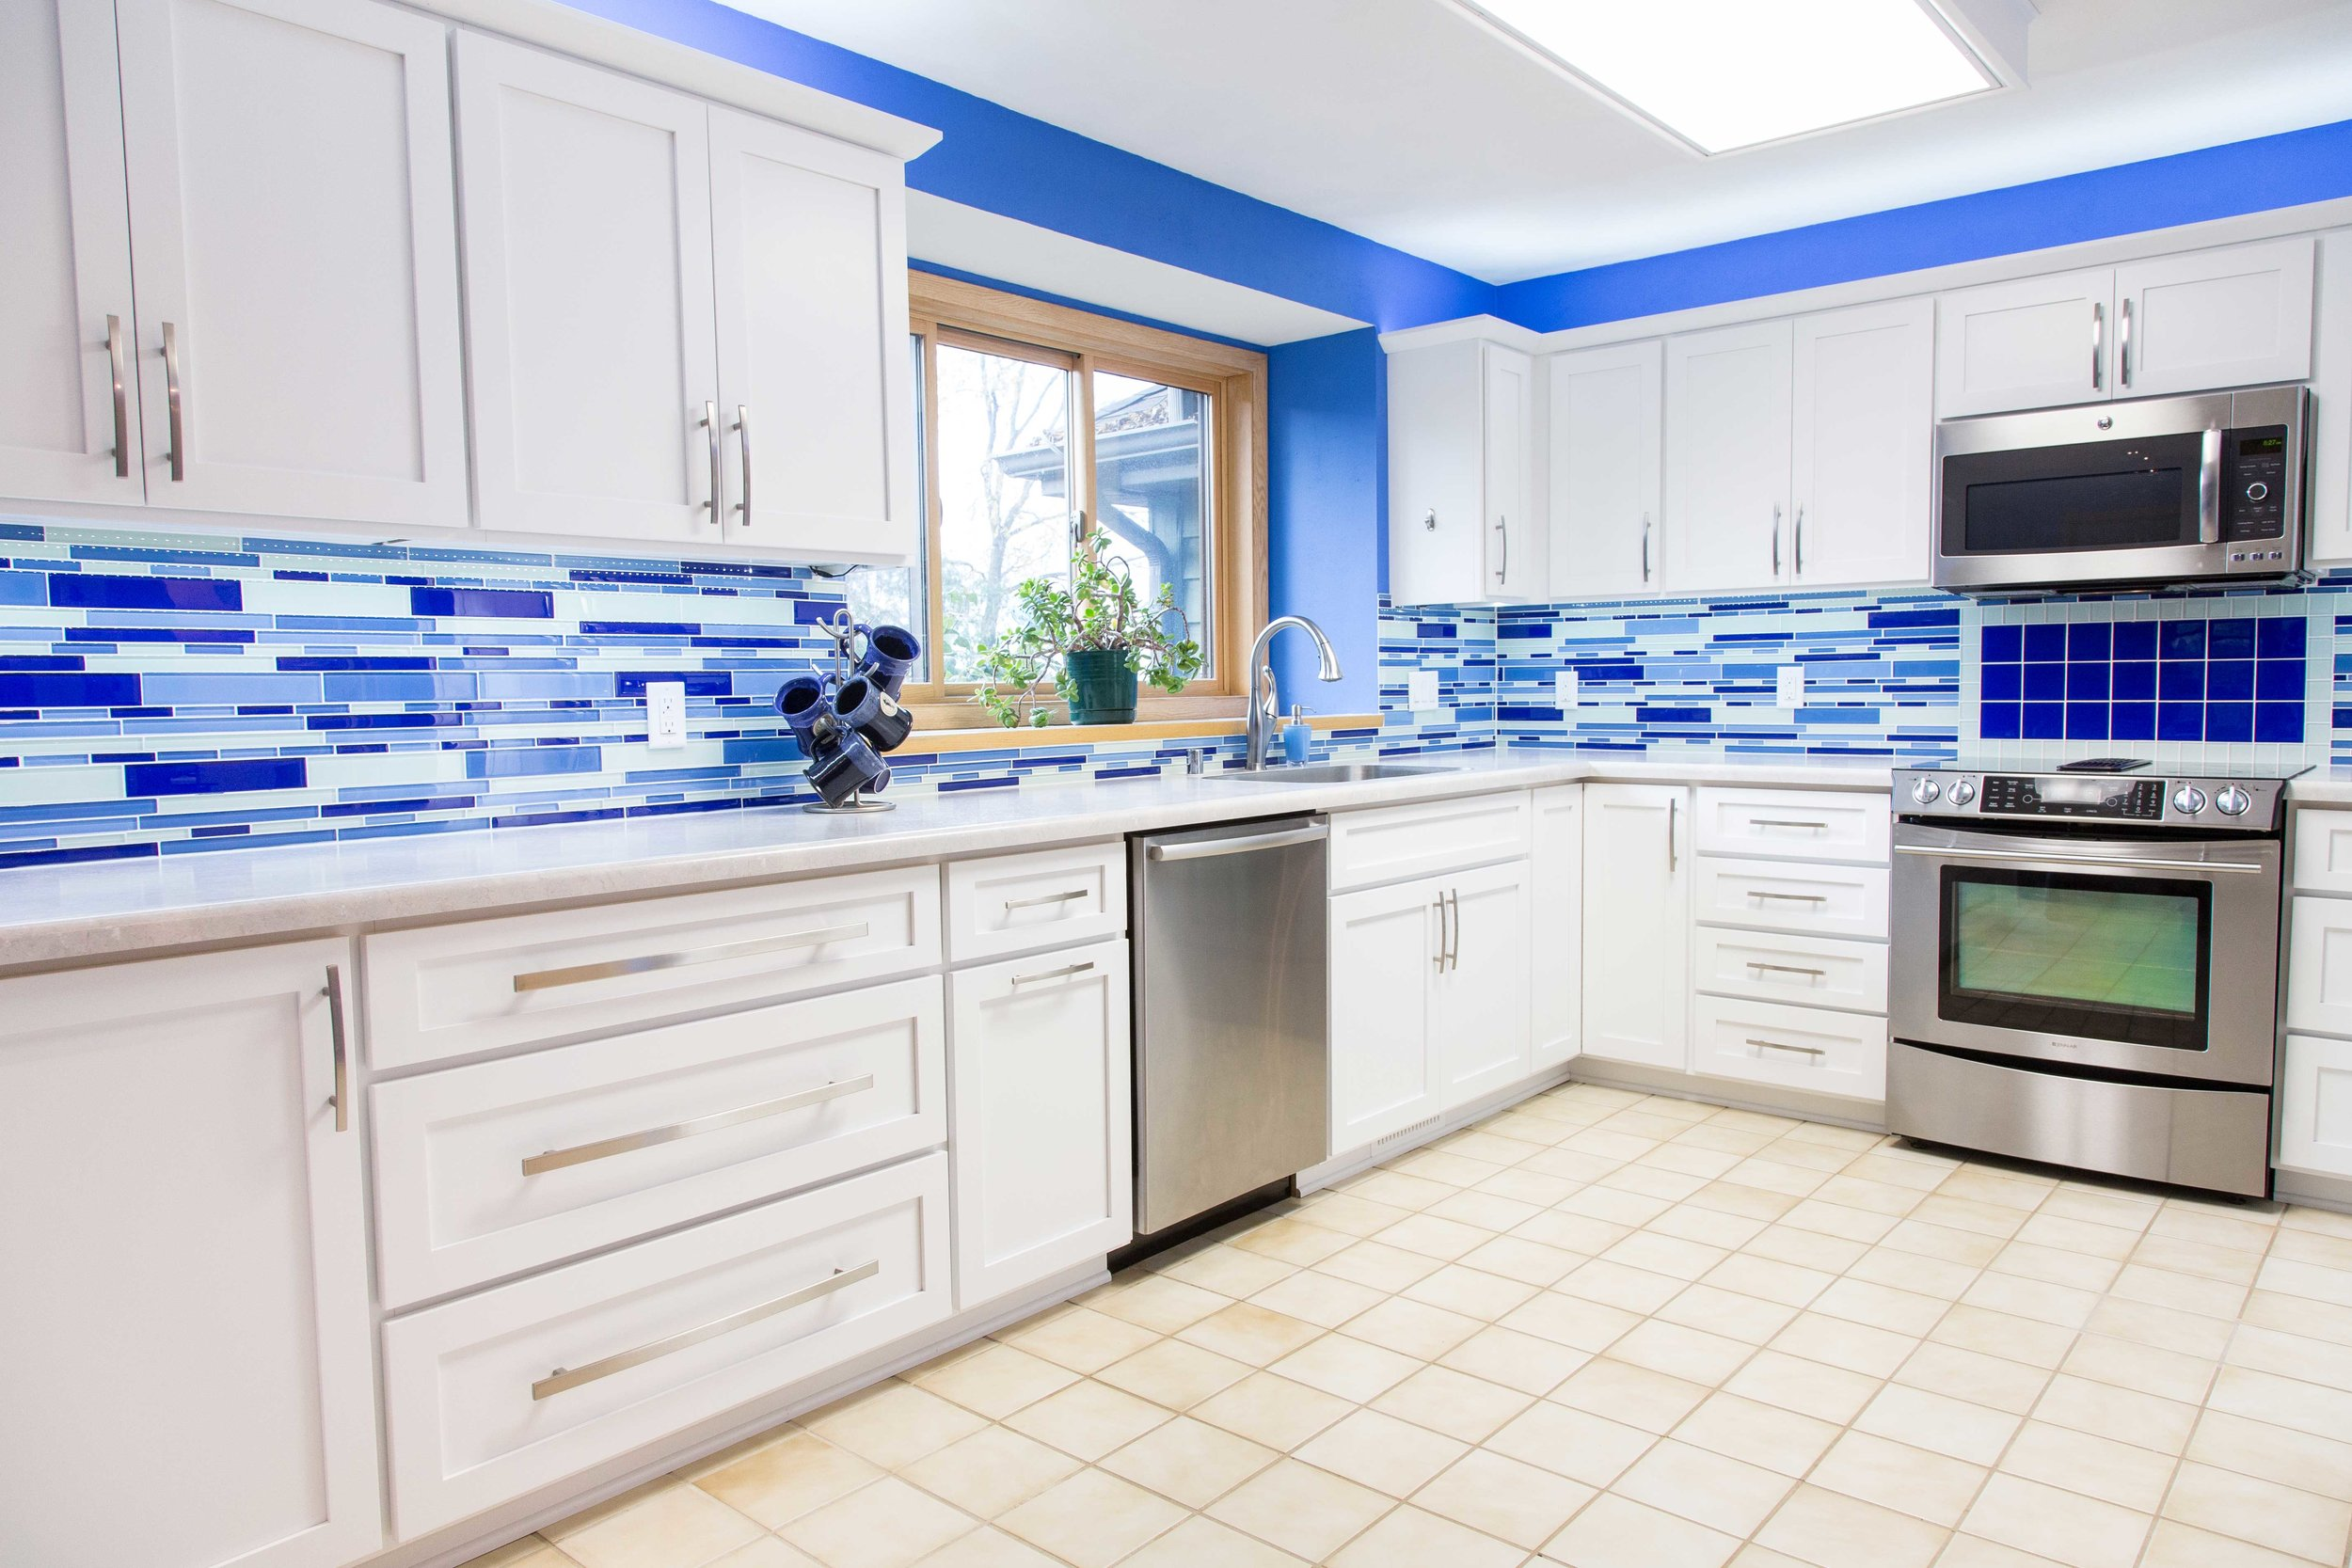 Blissful Blue Kitchen -   COTY AWARD 2014